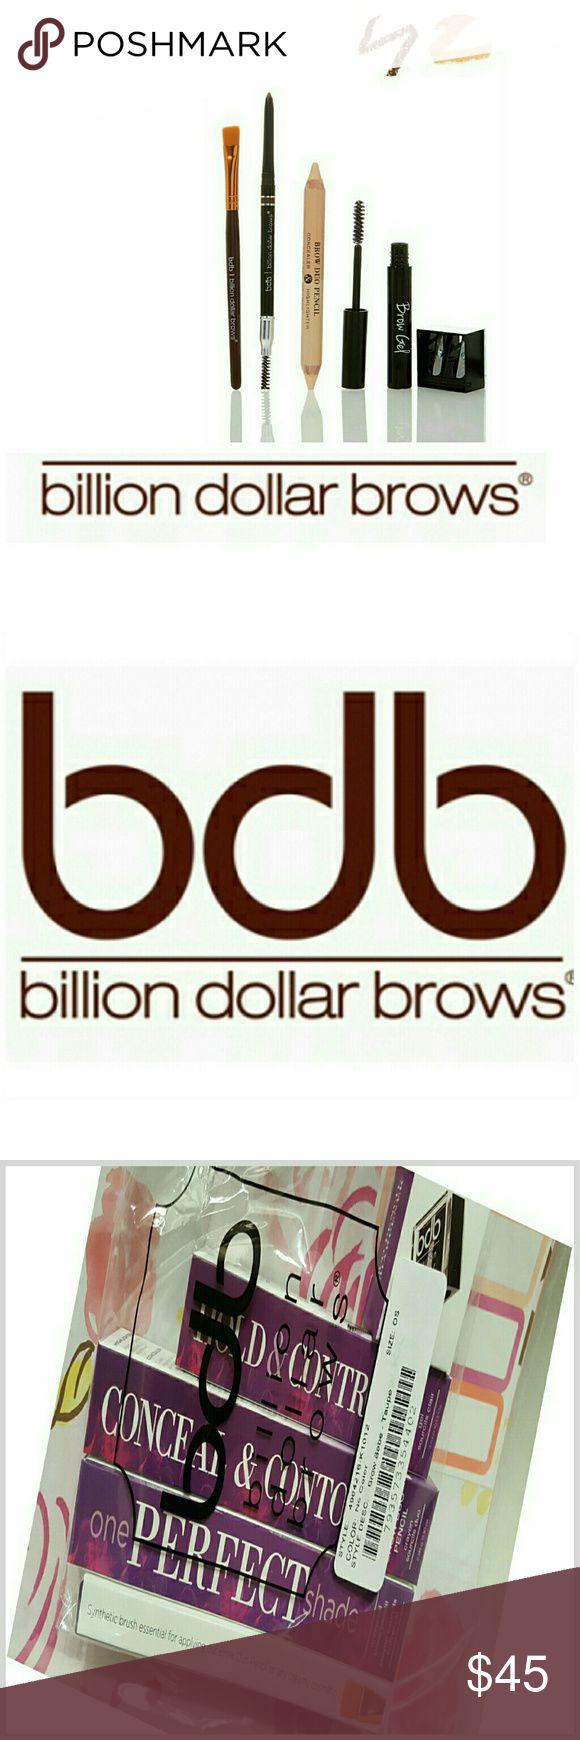 JUST IN BILLION DOLLAR BROWS  (TAUPE) Universal Brow Pencil  Brow Duo Pencil  Brow GEL Smudge Brush Sharpener Billion Dollar Brows Makeup